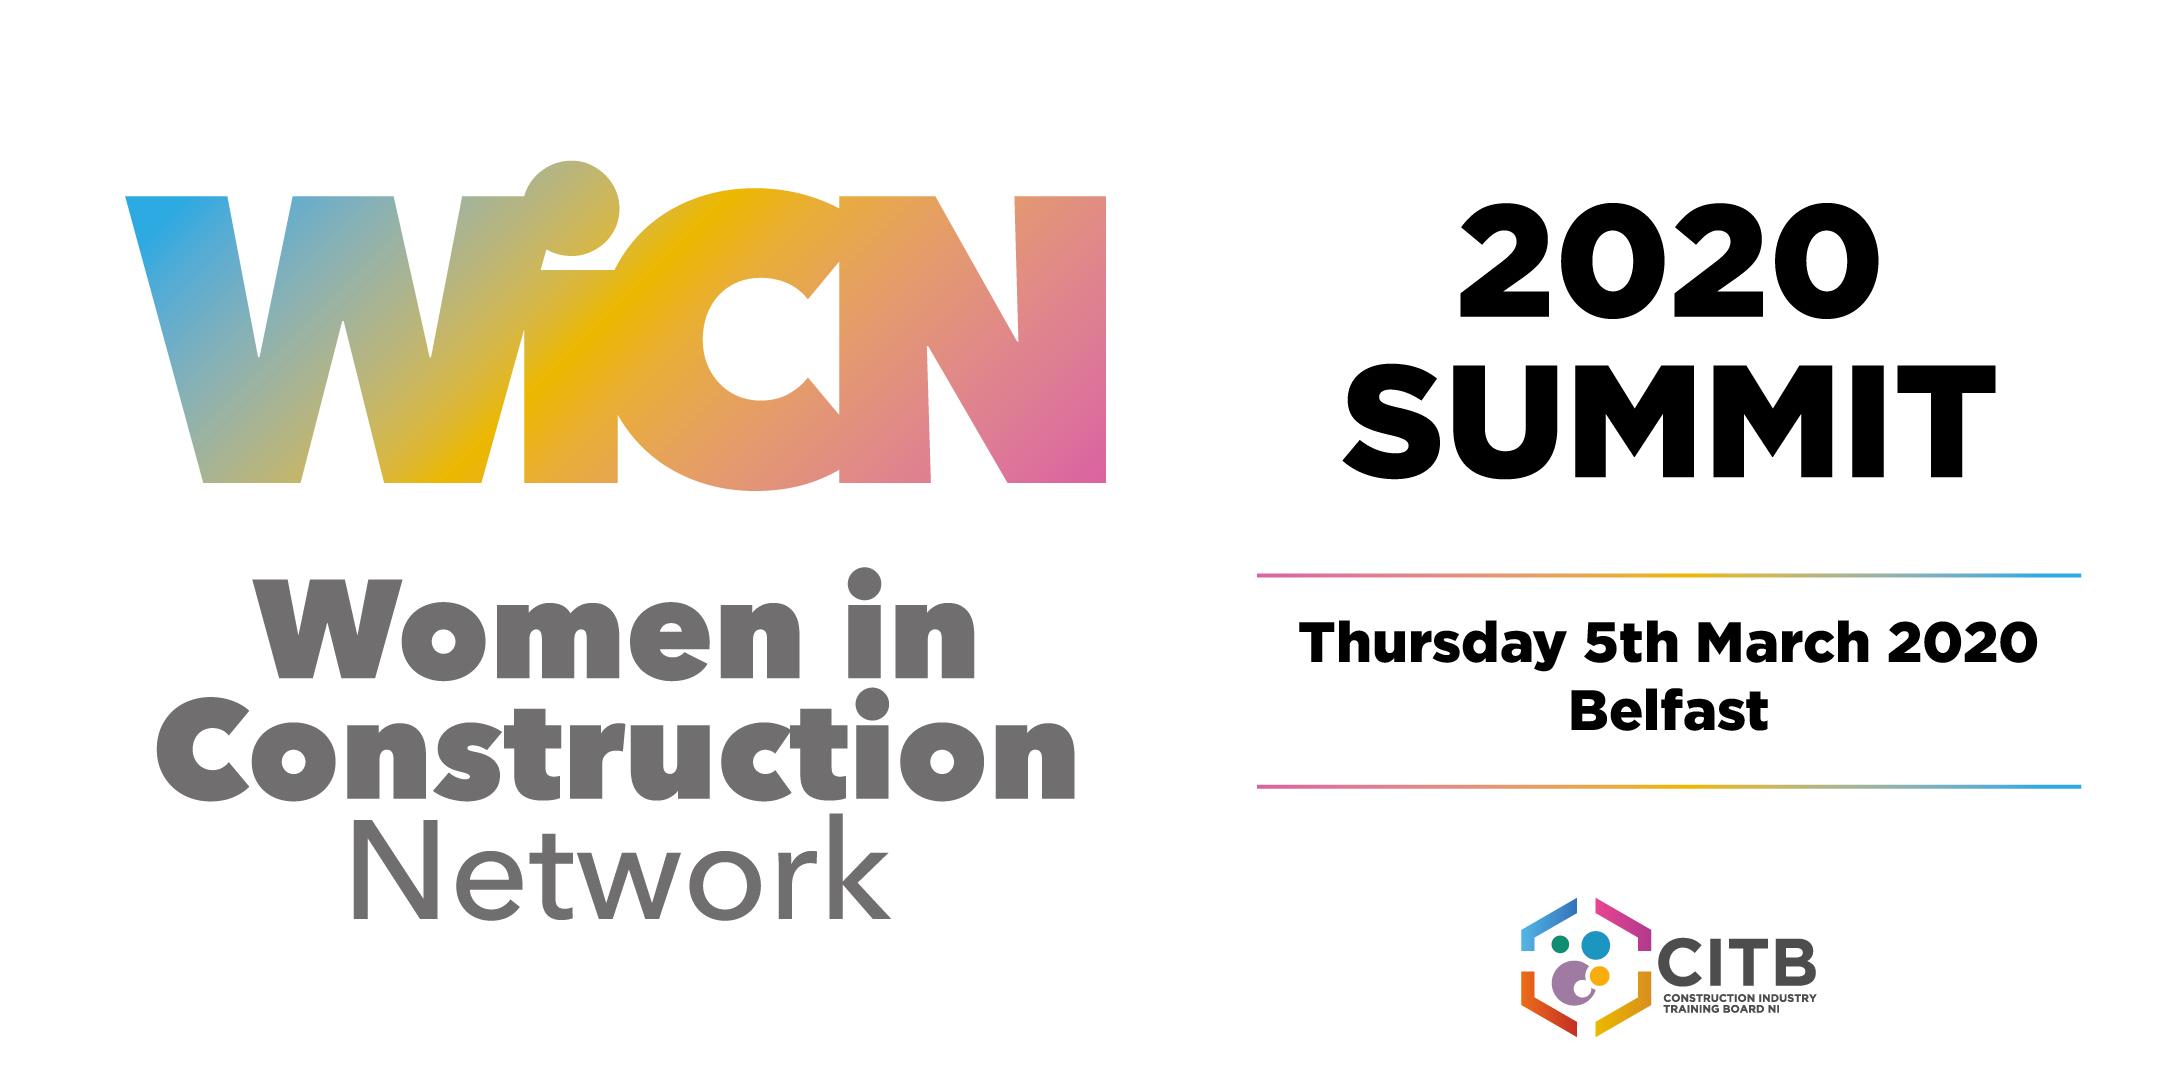 Women in Construction Summit 2020